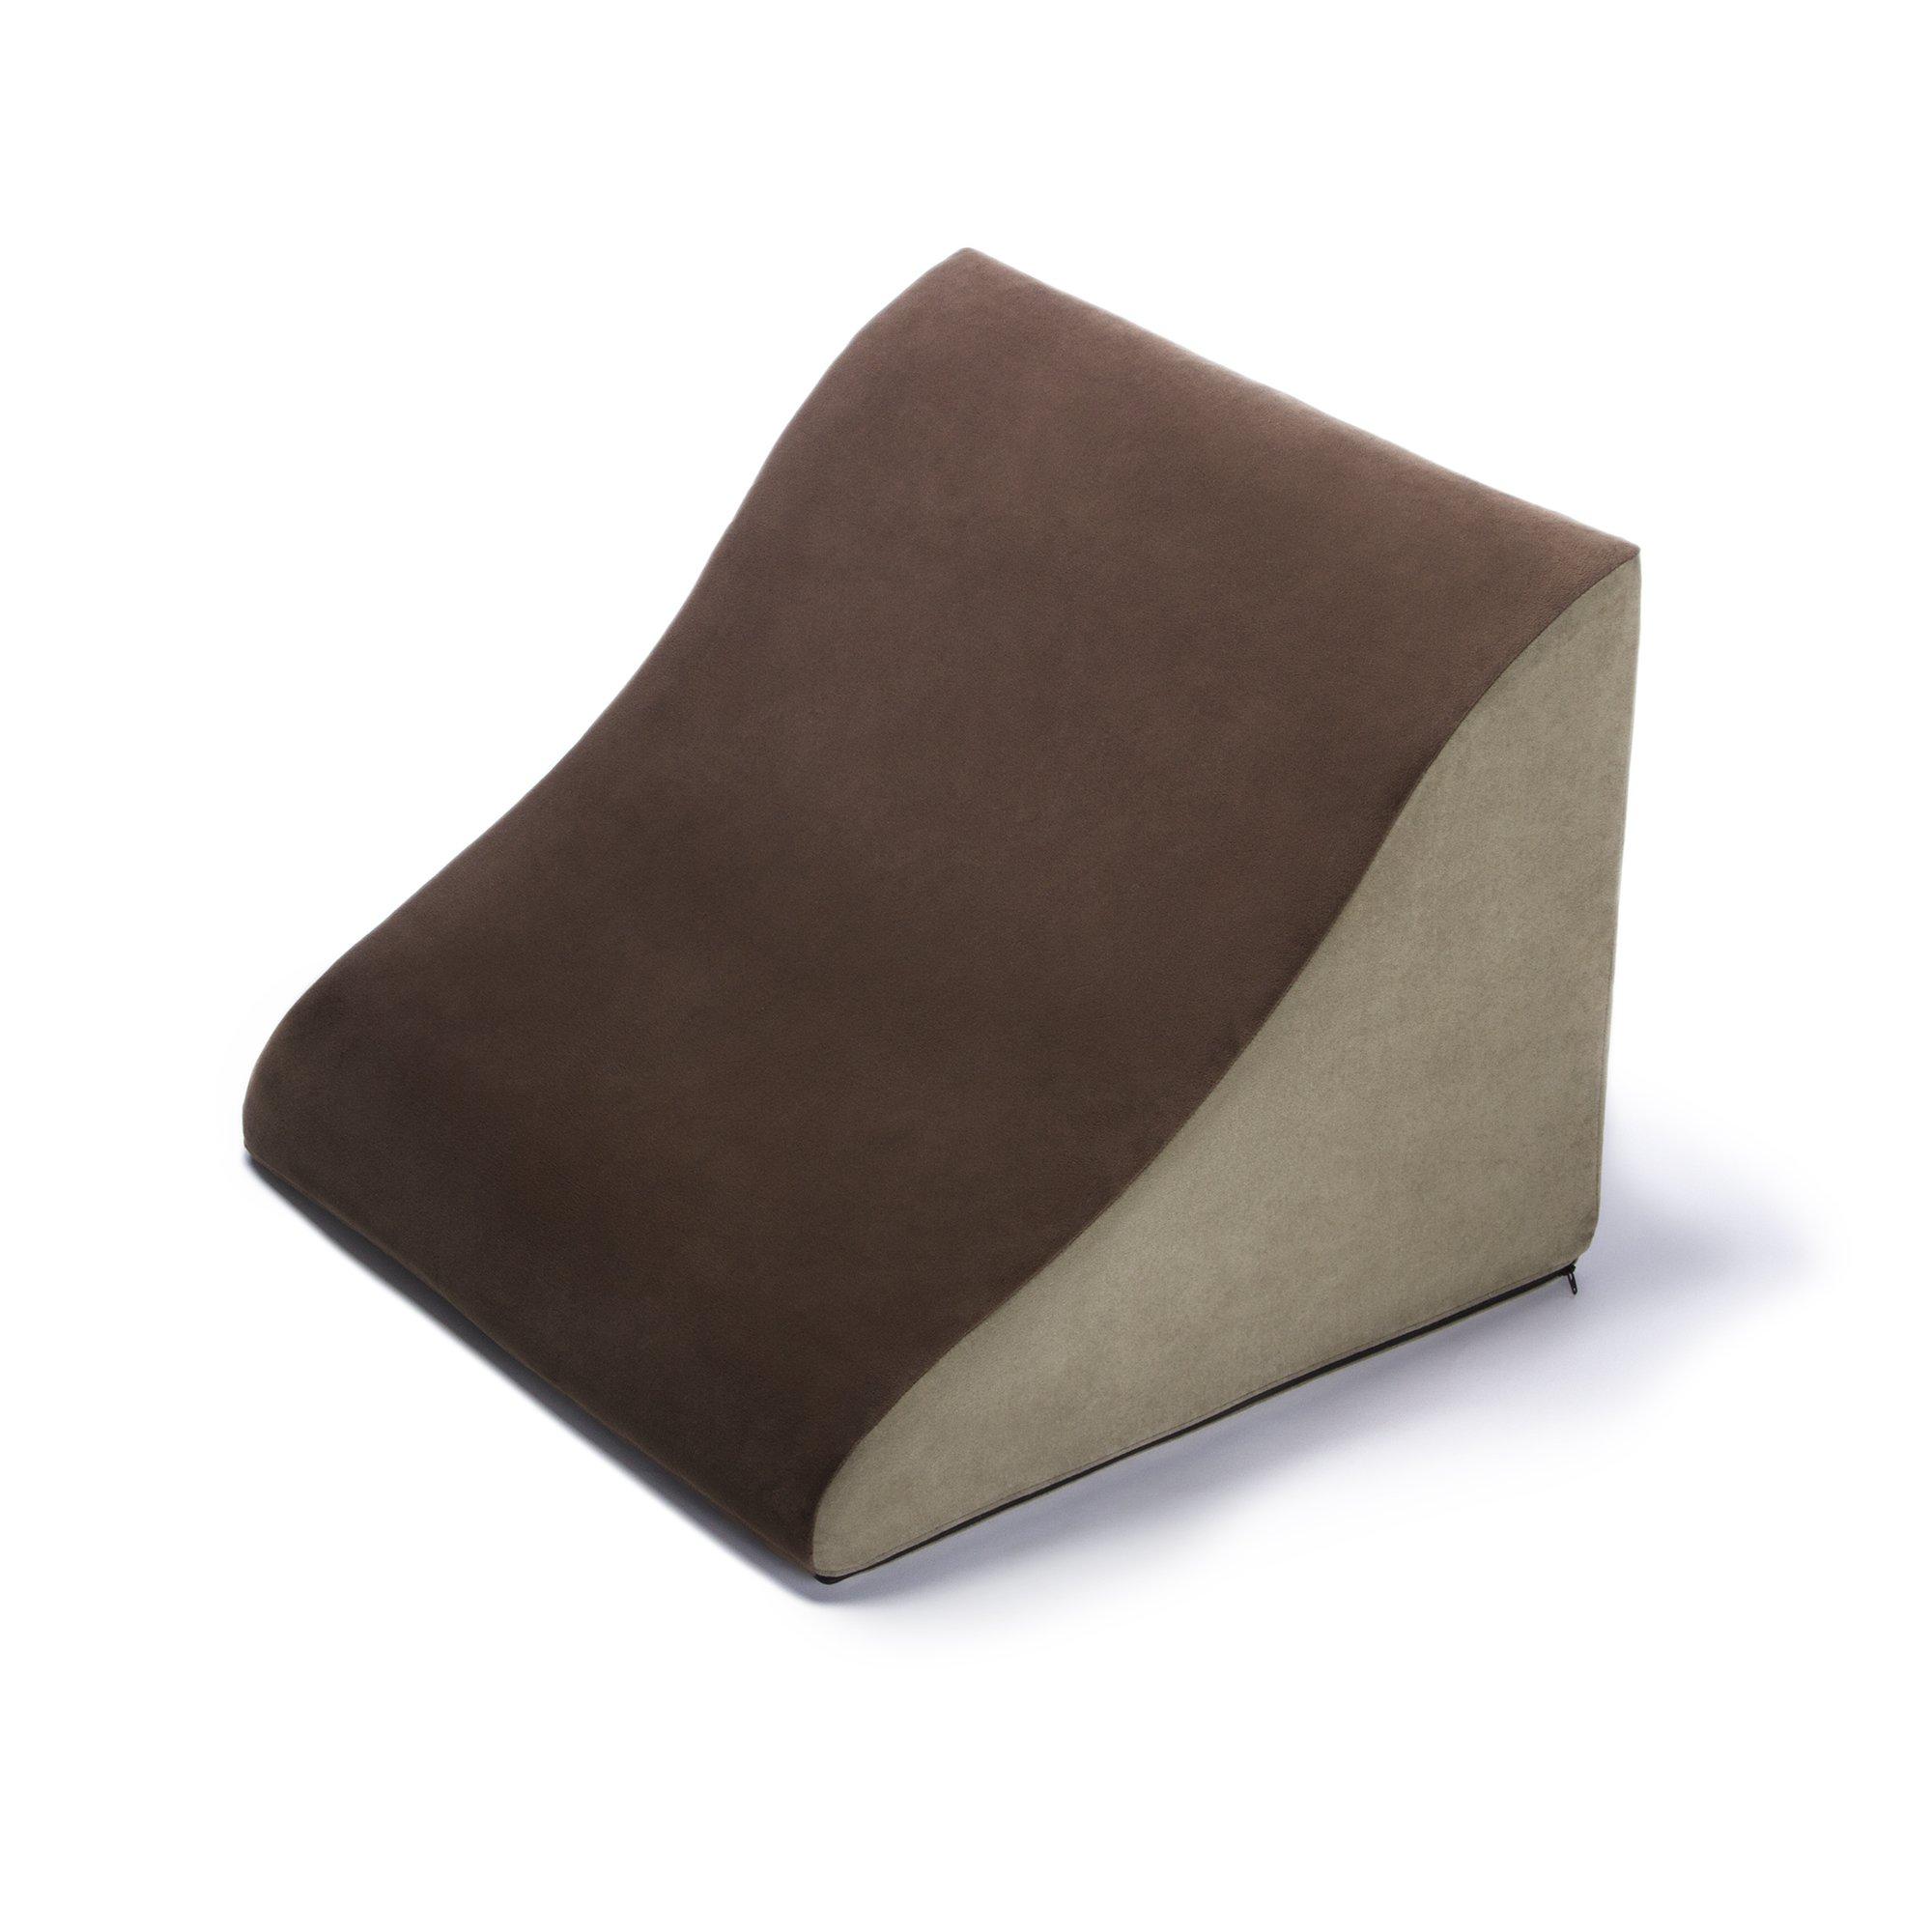 Avana Back Rest Memory Foam Back/Lumbar Pillow, Mocha/Sage